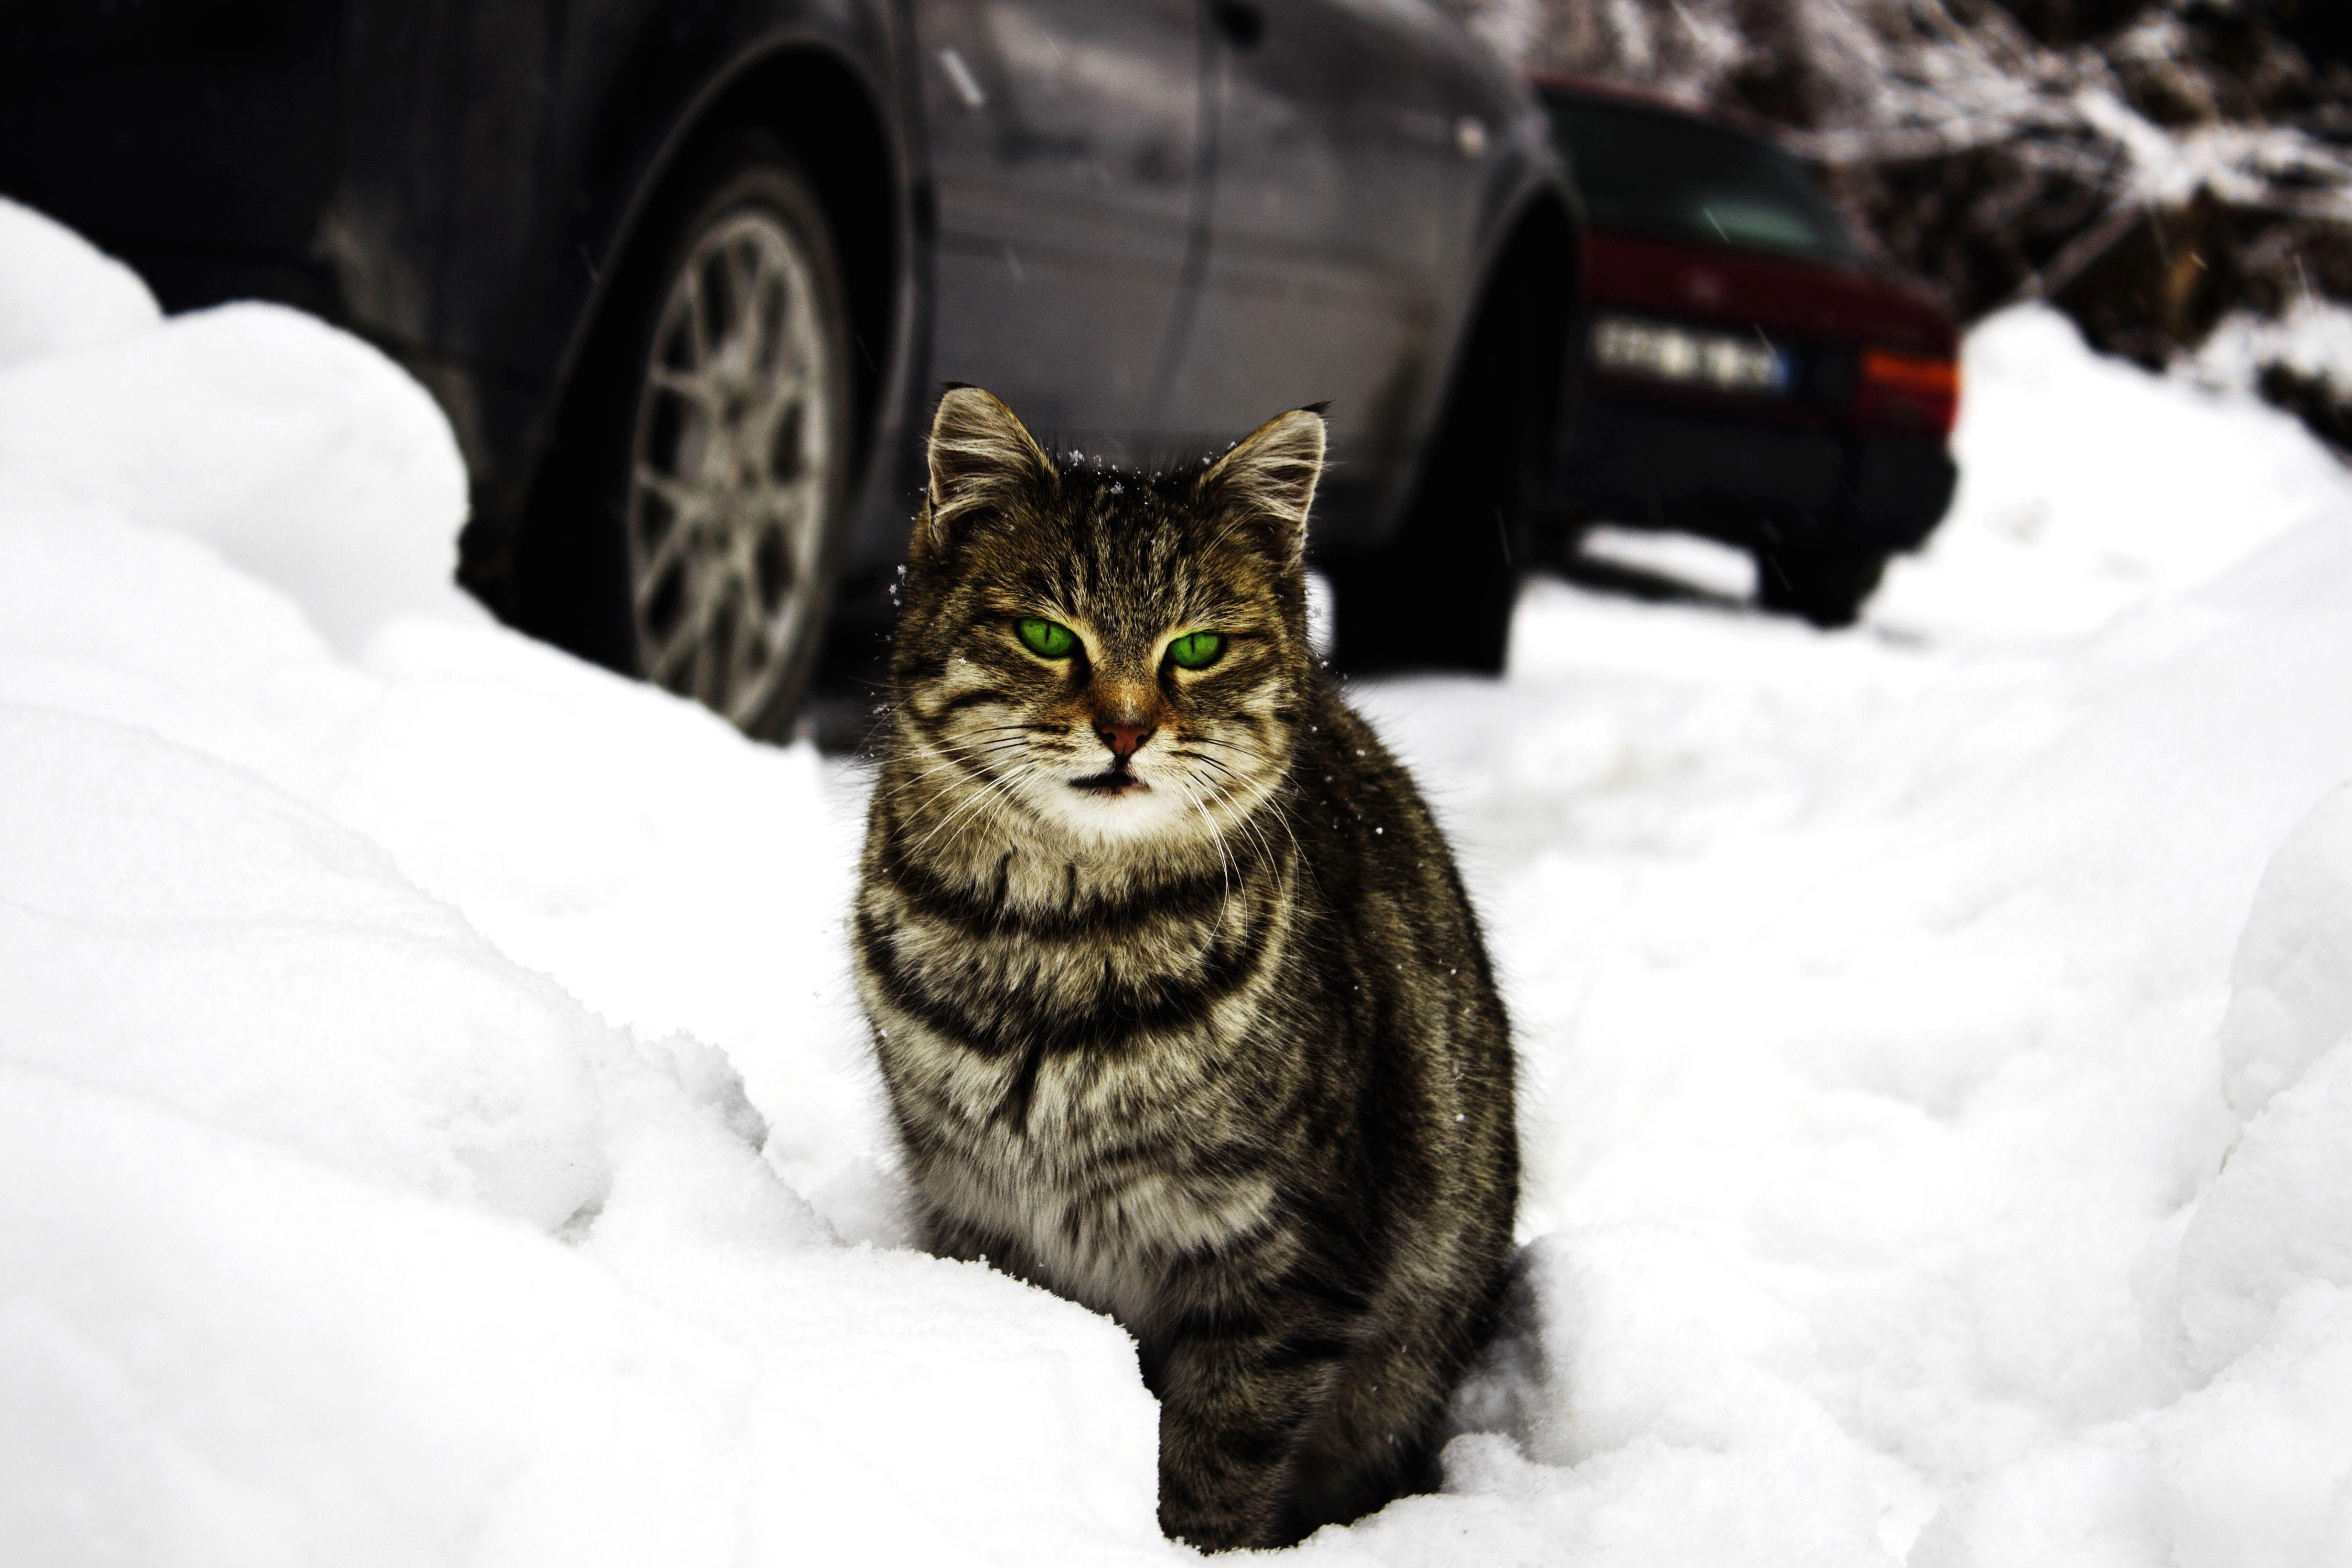 8100 Gambar Hewan Mamalia Kucing Gratis